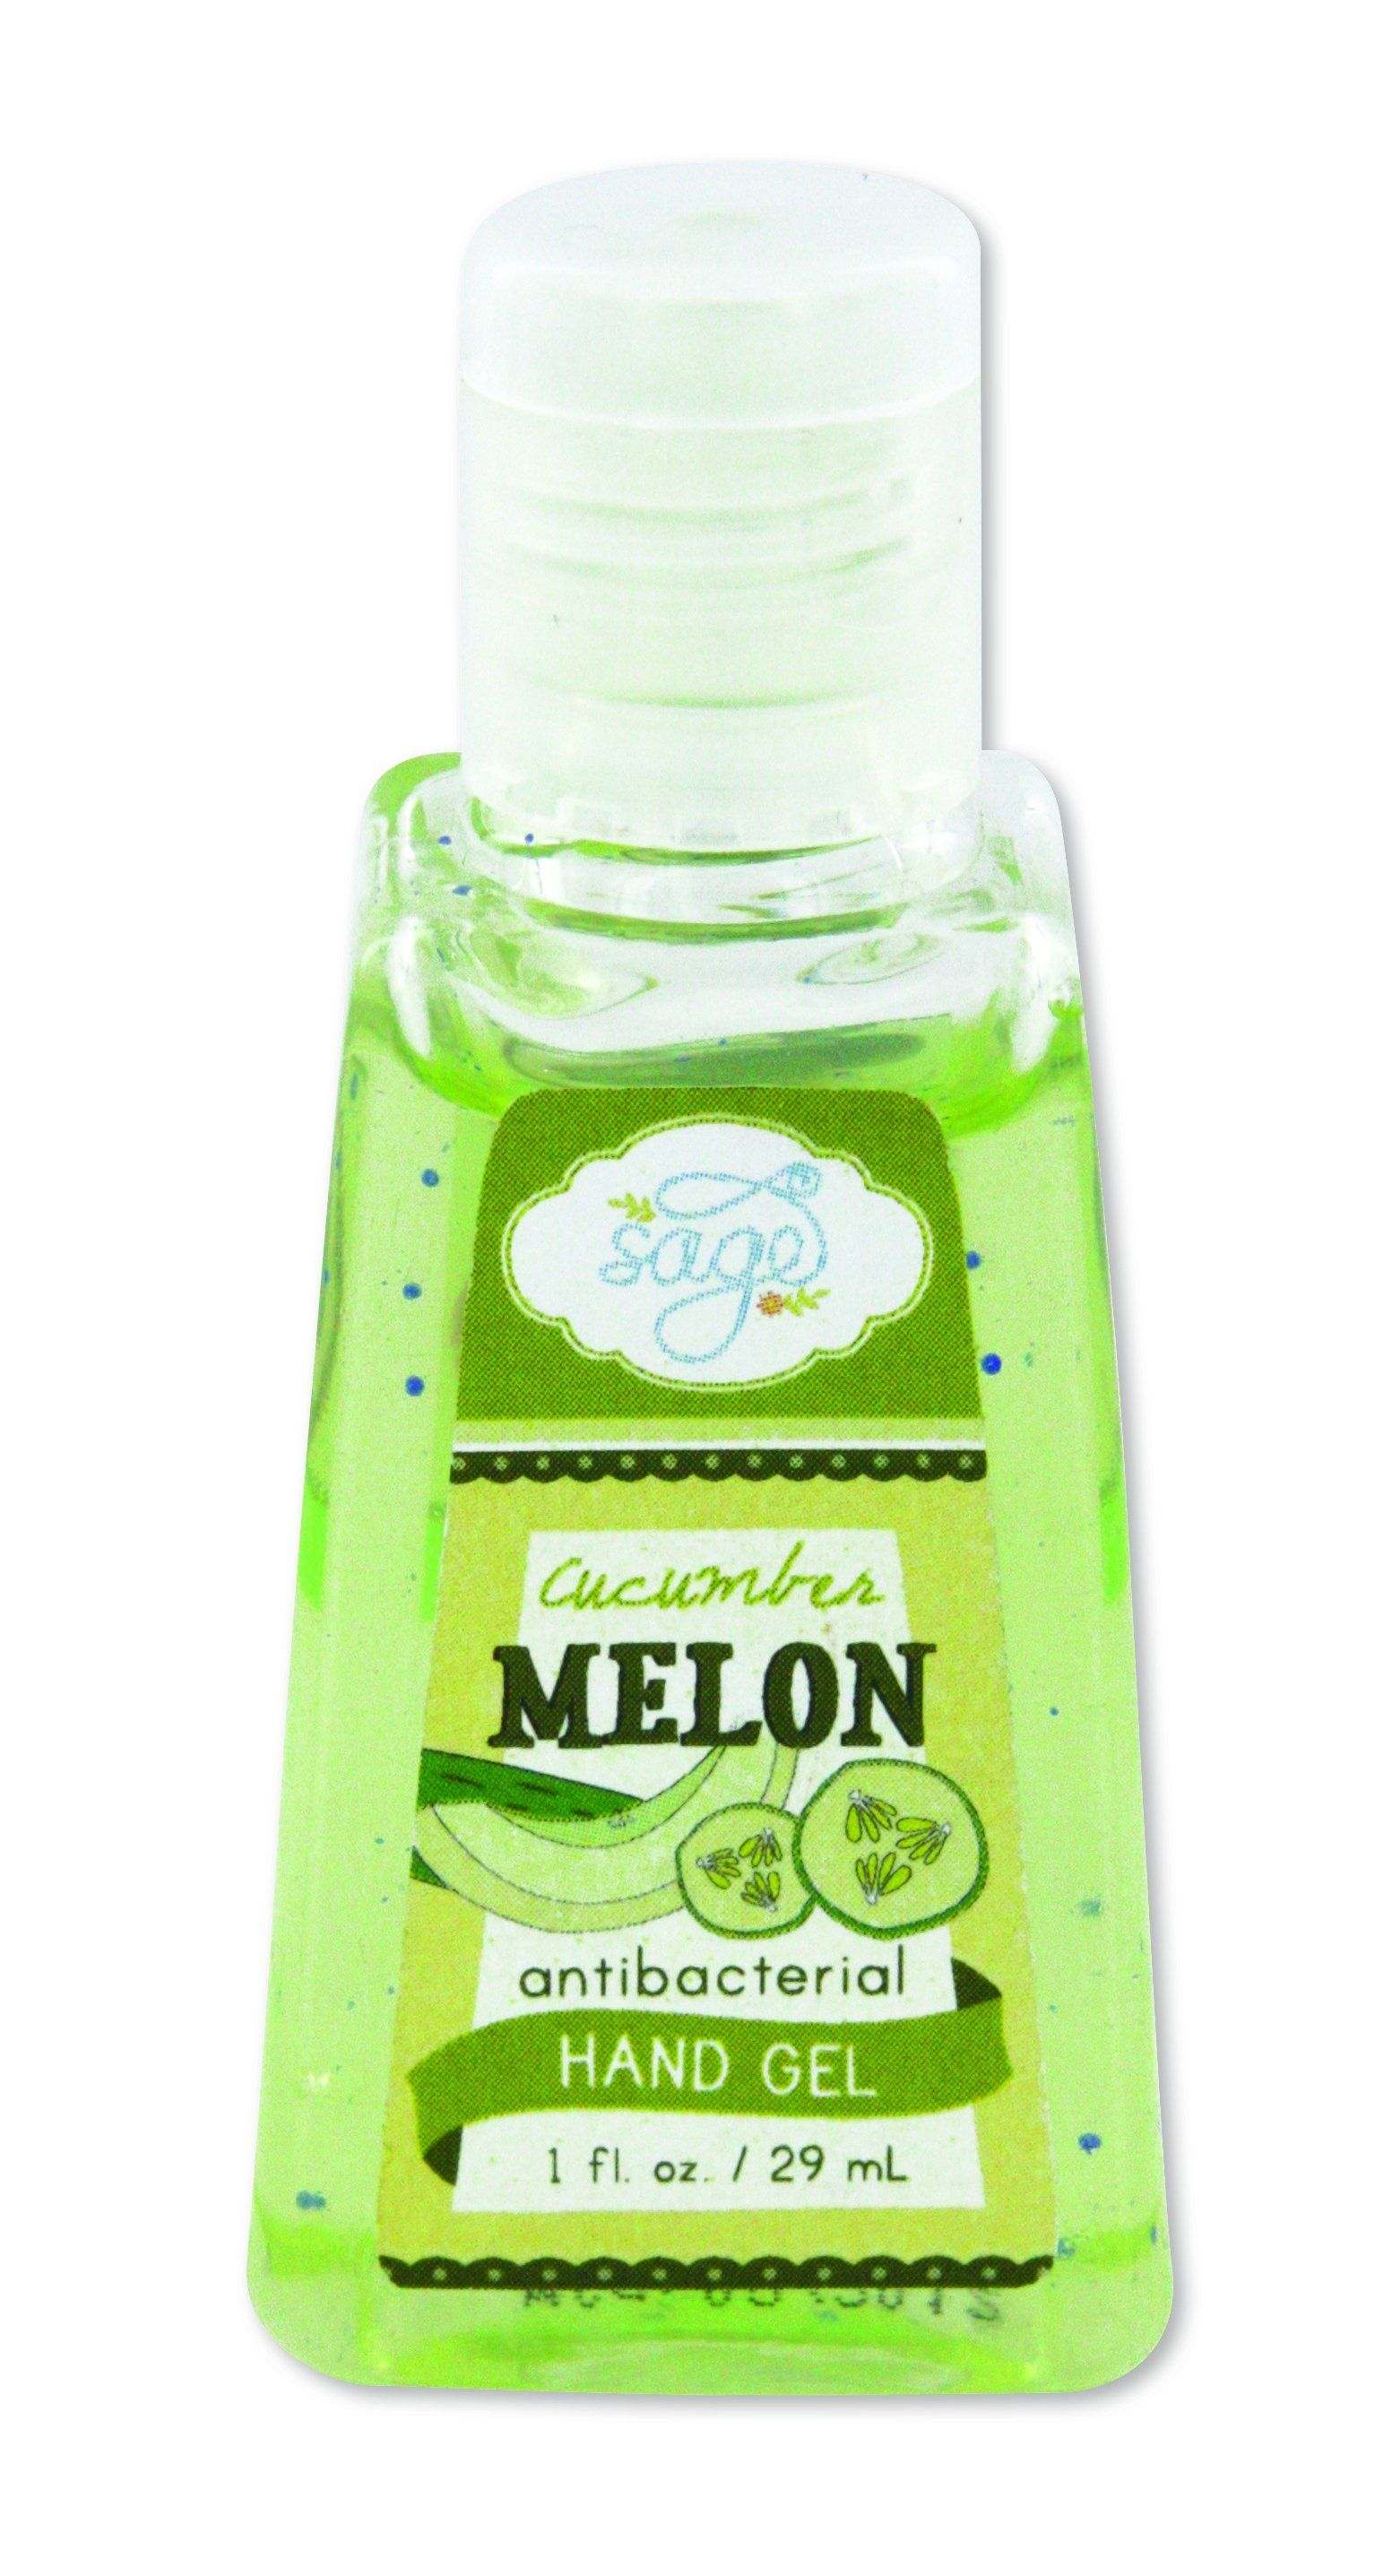 B245 R522 Sage Hand Sanitizer Cucumber Melon Cucumber Melon